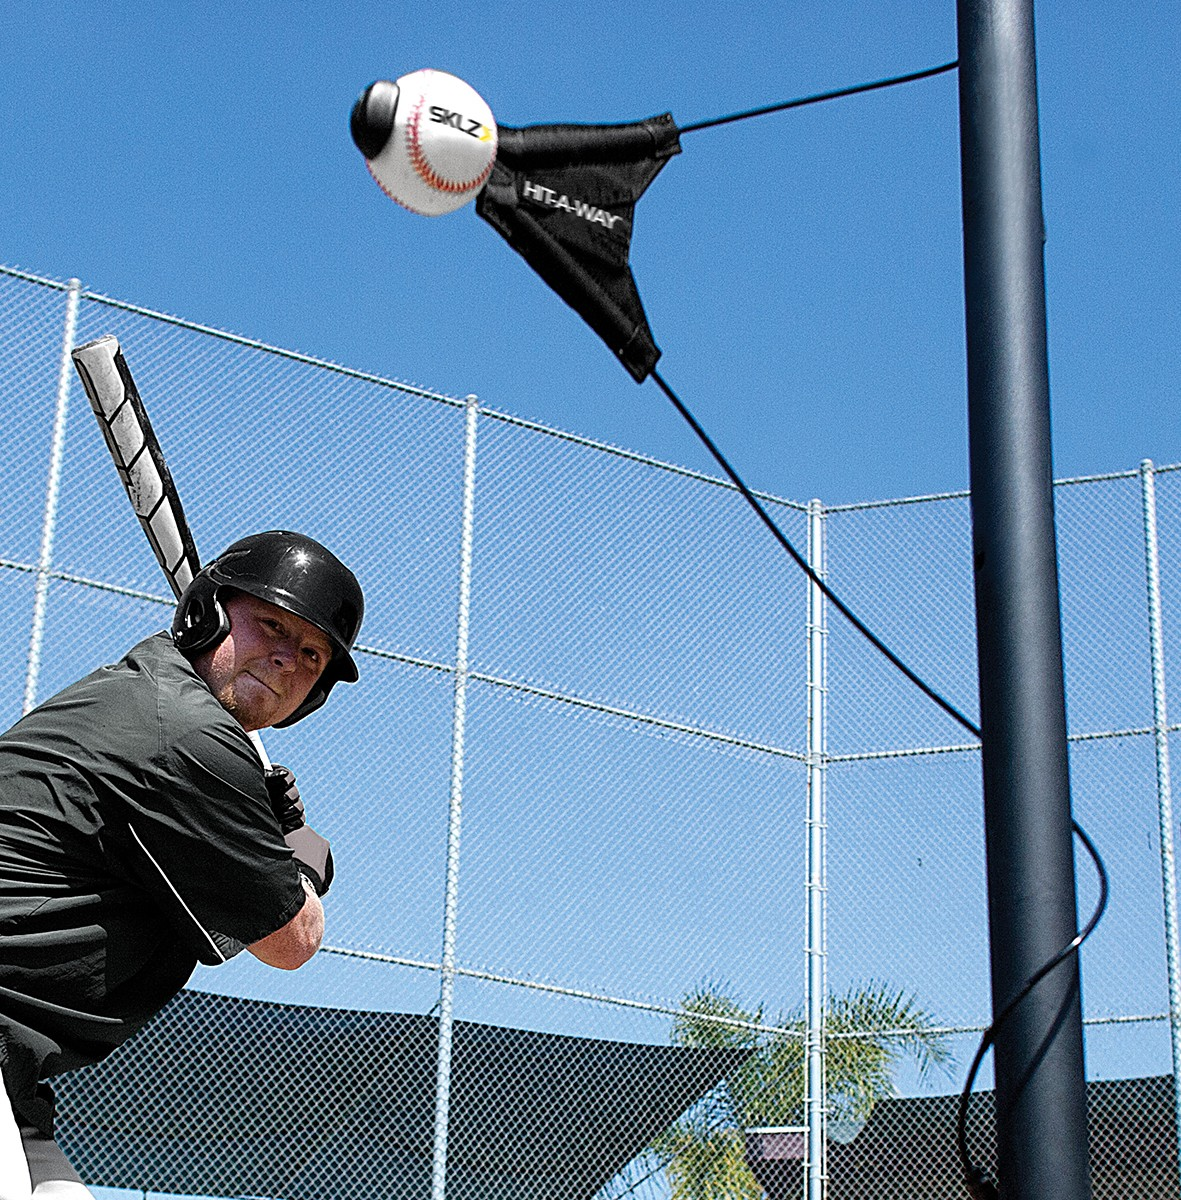 Sklz Hit A Way High Repetition Baseball Solo Batting